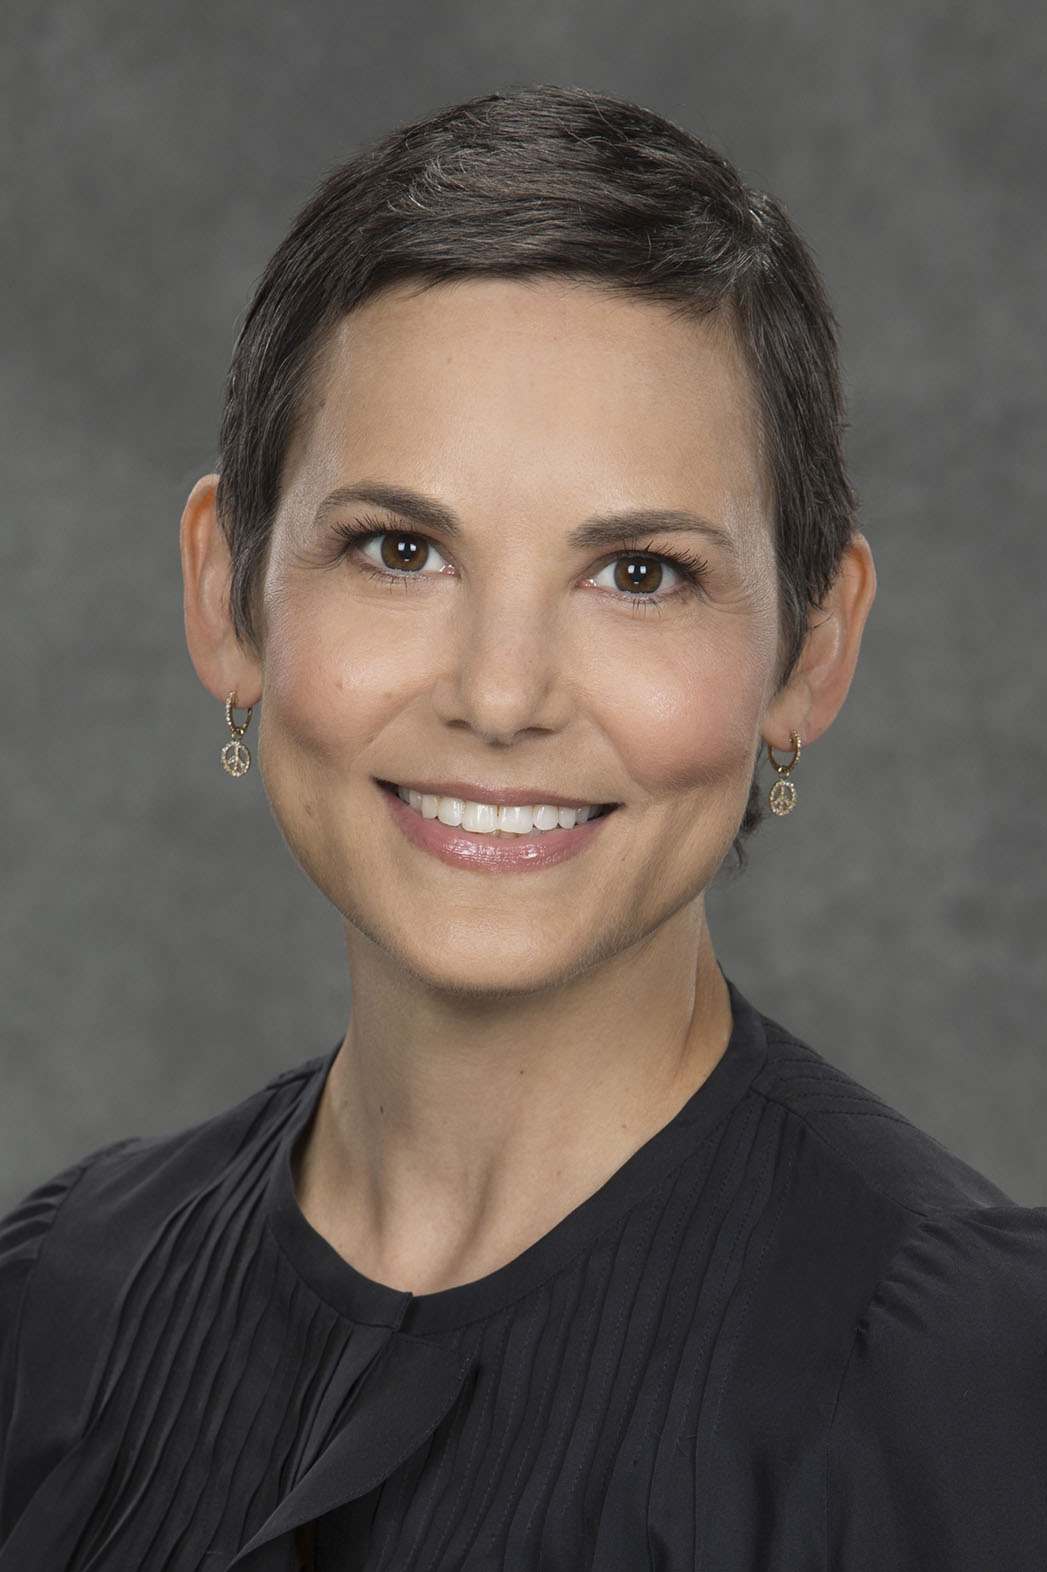 Julie McNamara Headshot P 2016